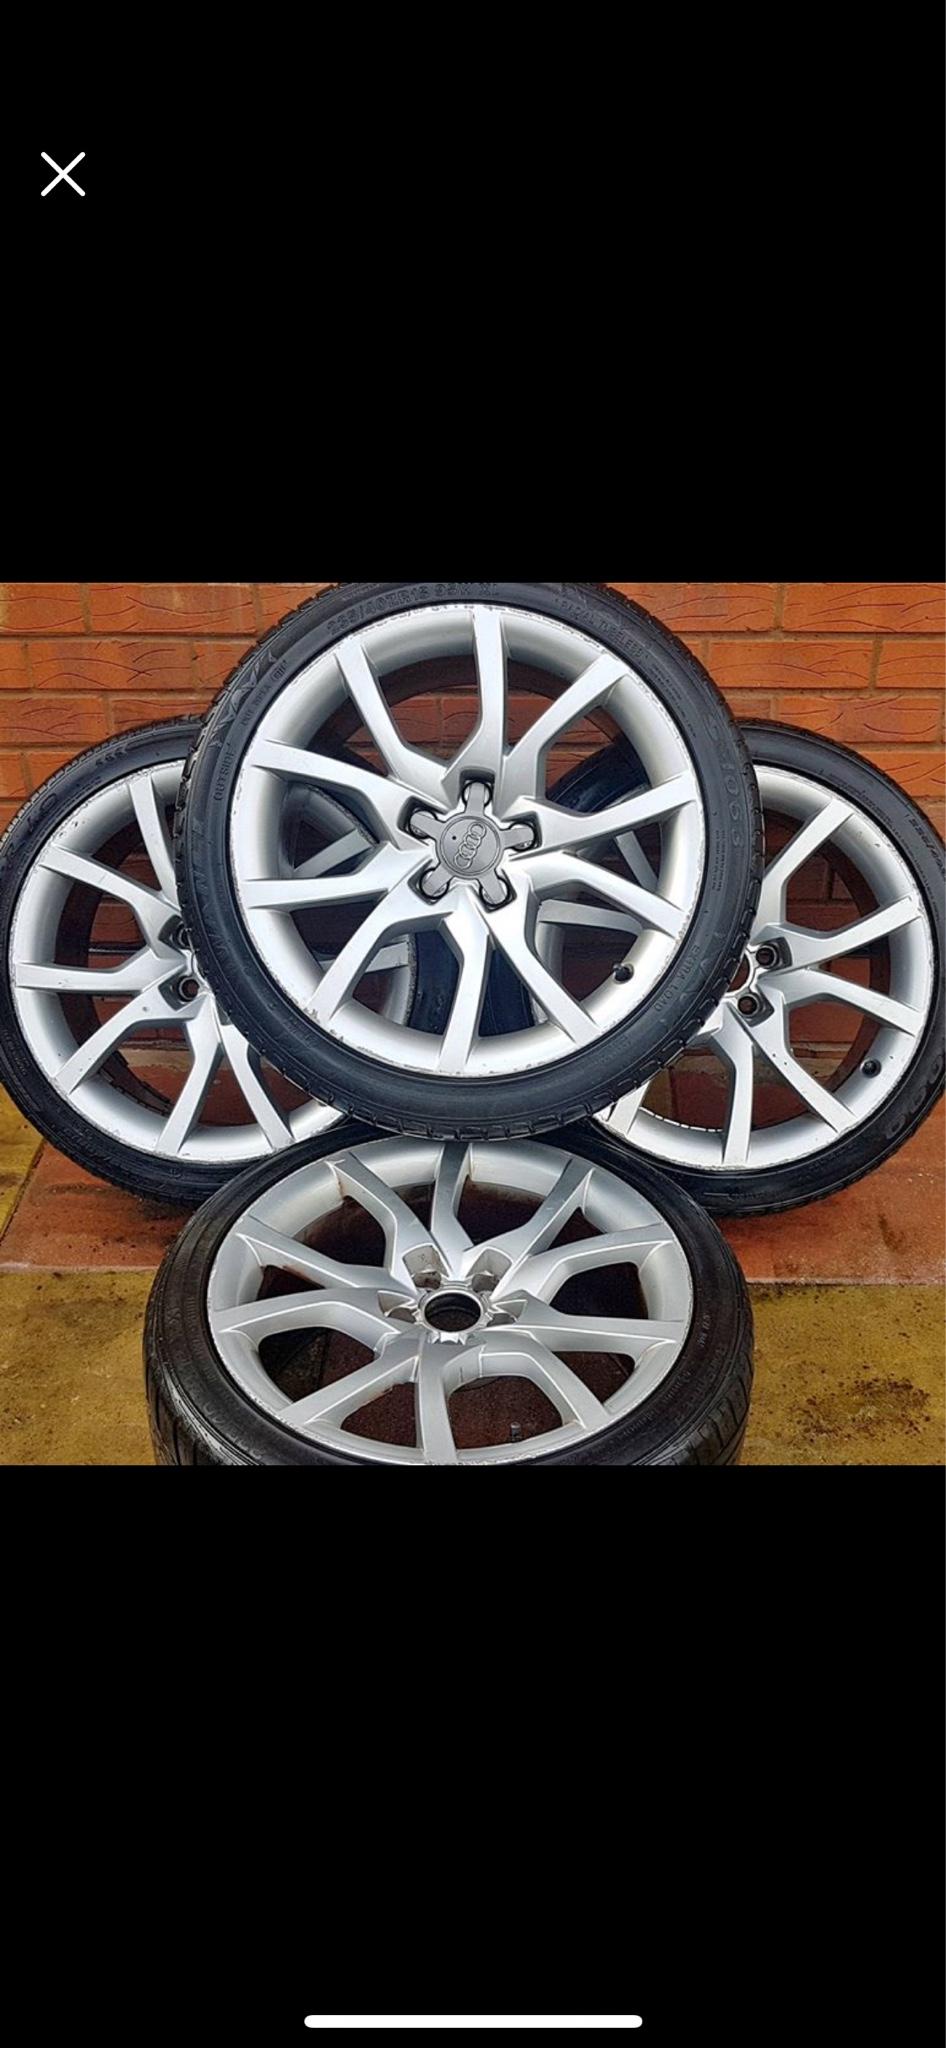 Audi A5 Coupe 18 Alloy Wheels Genuine Audi Speedline 5 X 112 Et29 8 5j Audi Sport Net